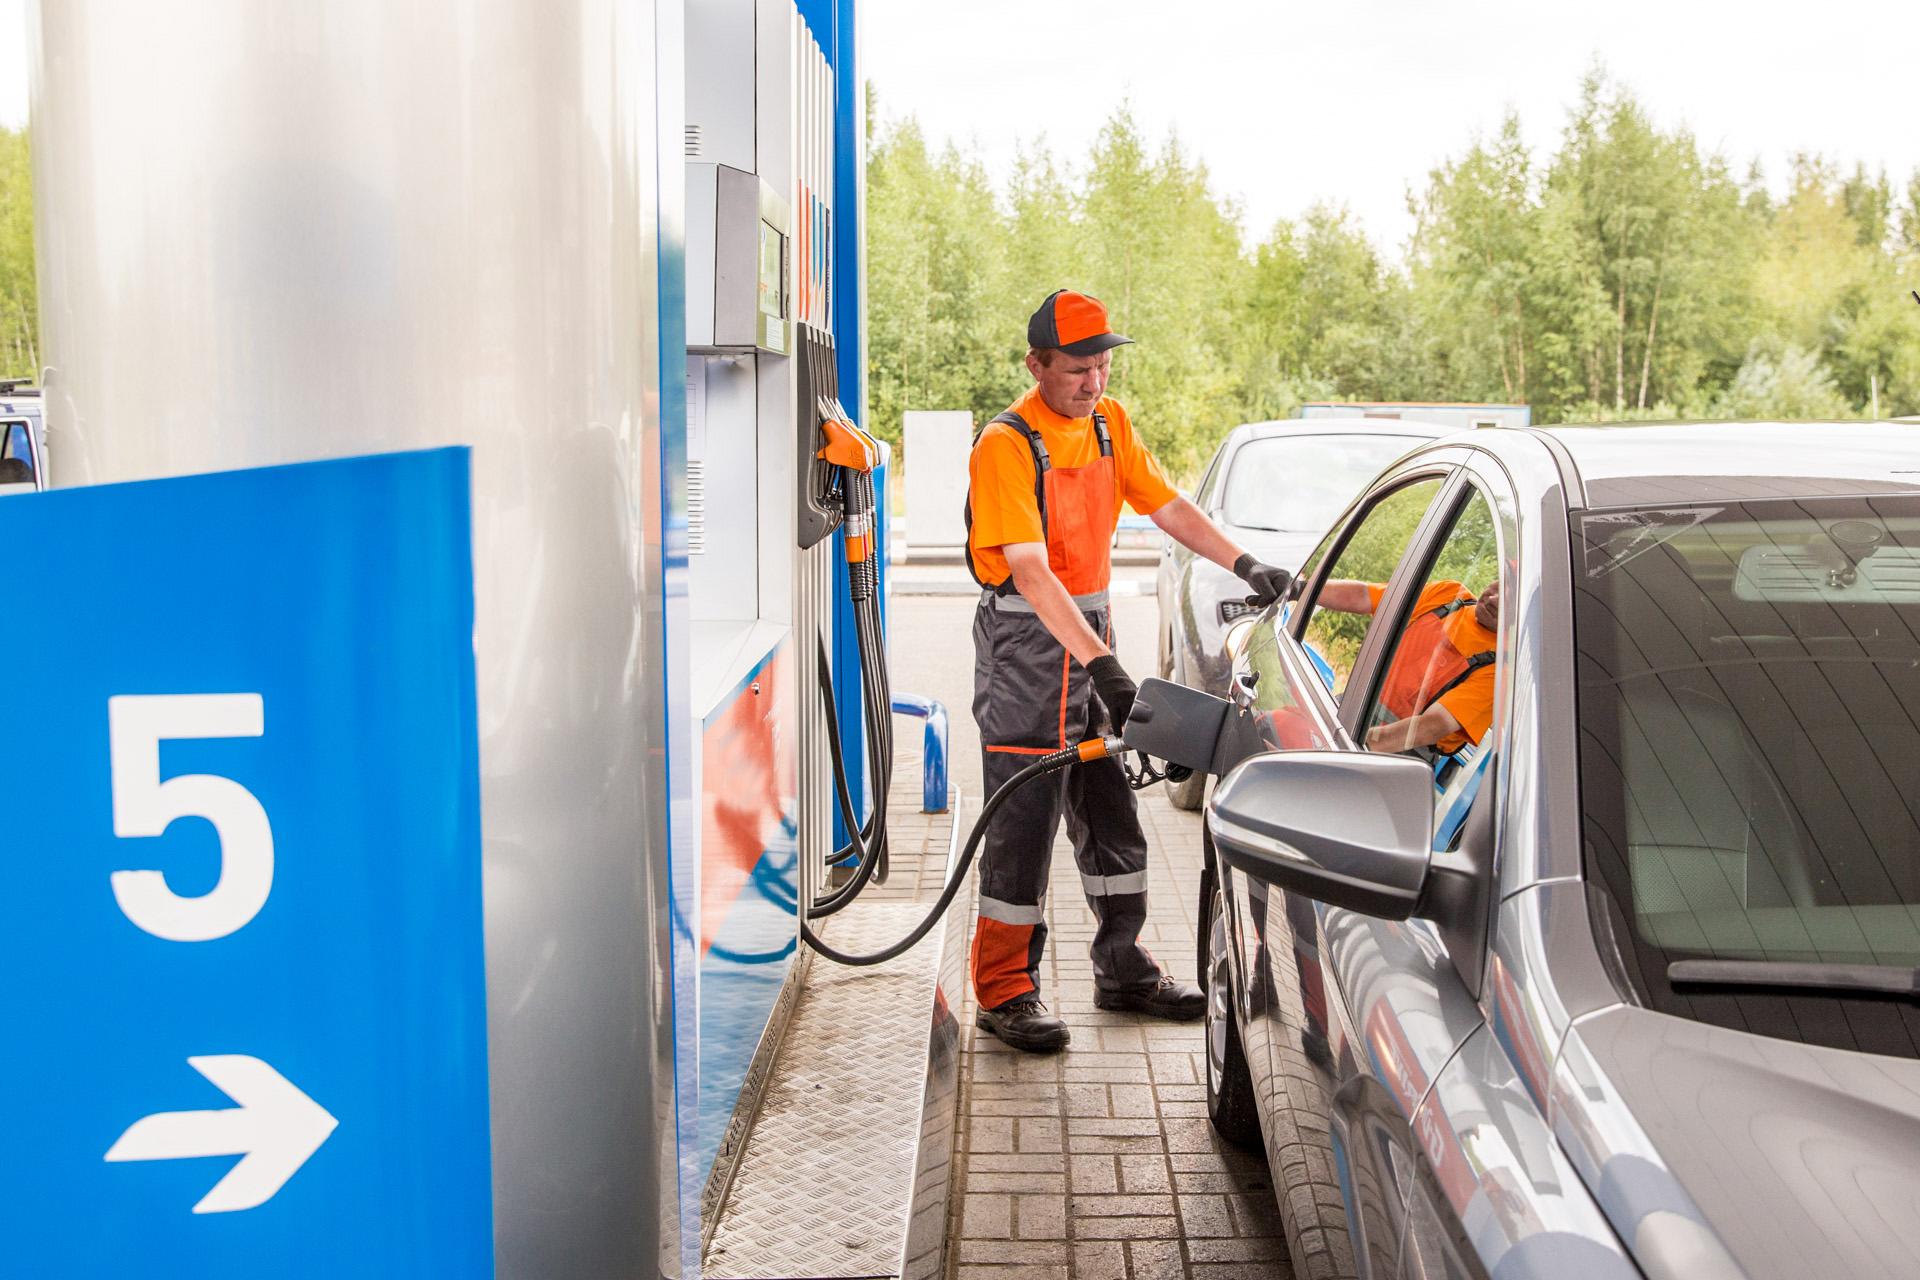 Цена на бензин не привязана к цене на нефть